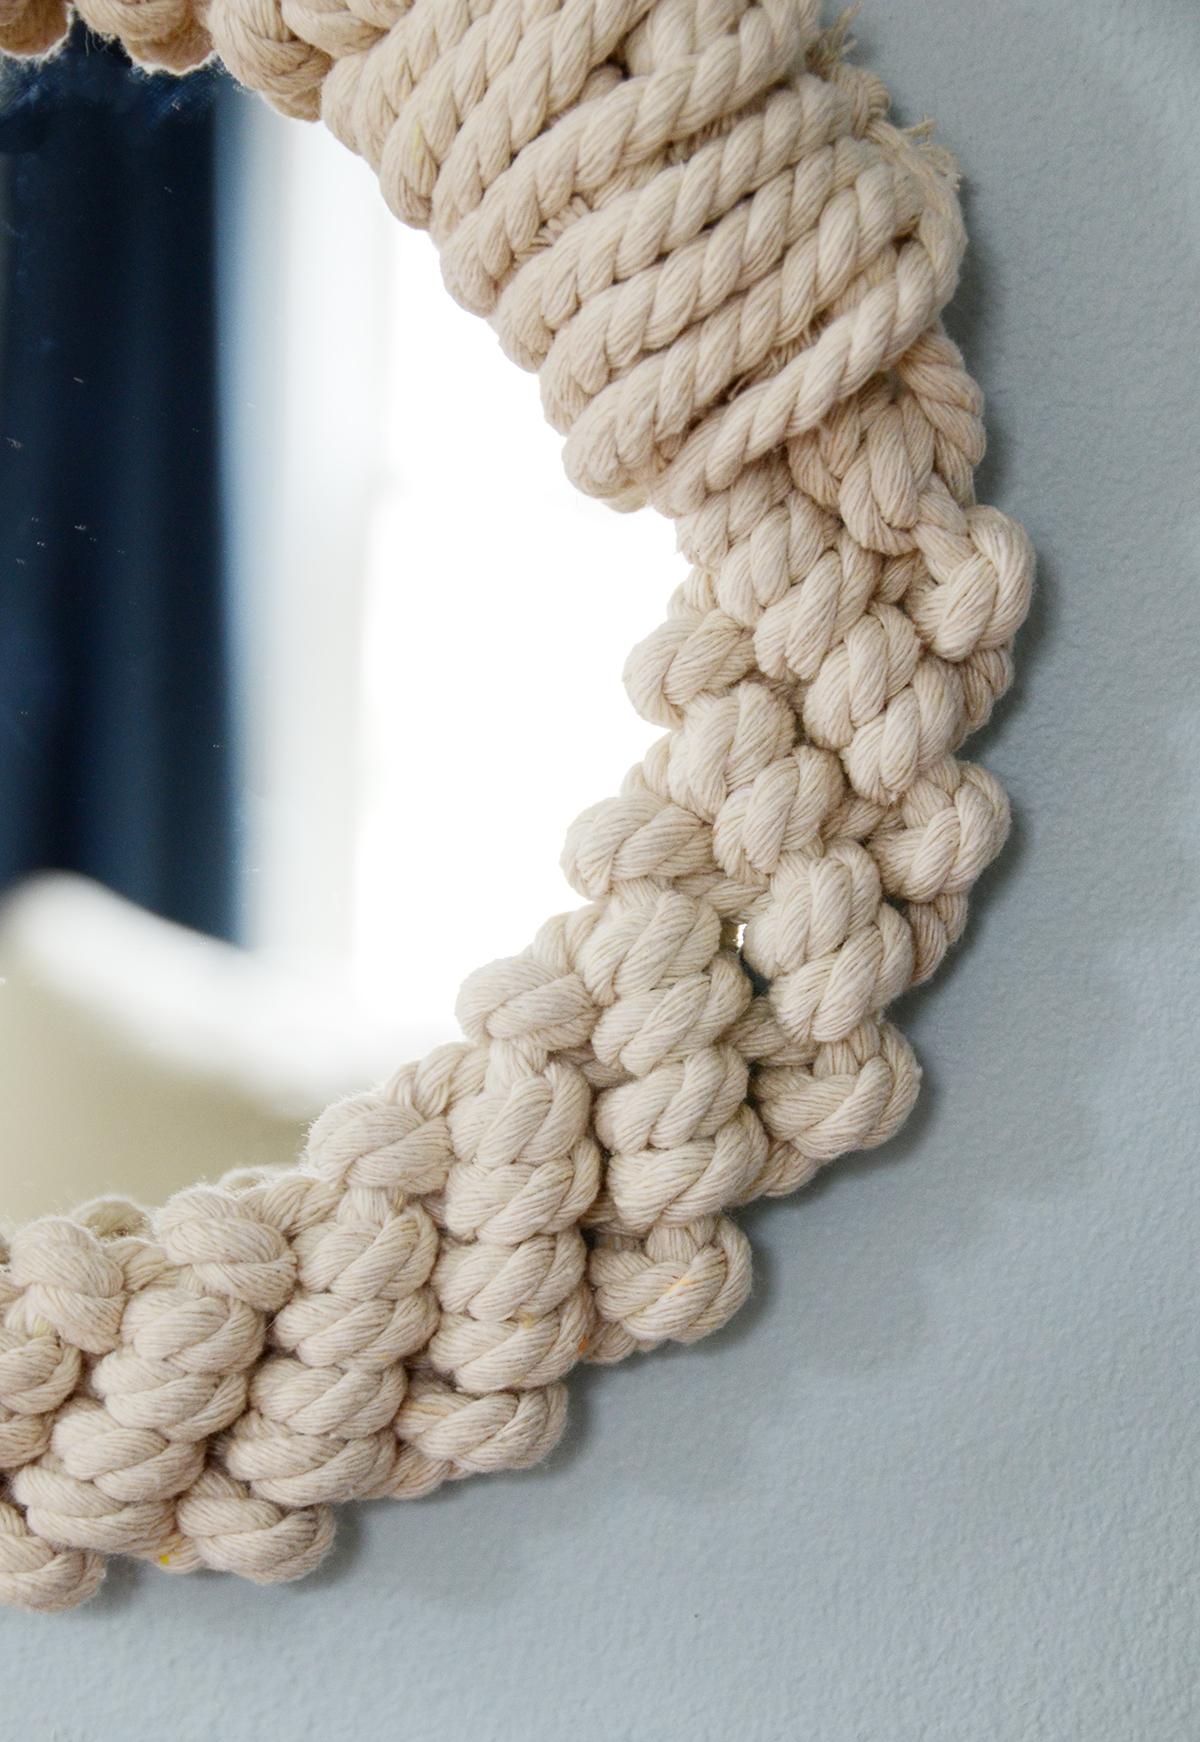 Diy rope mirror 9